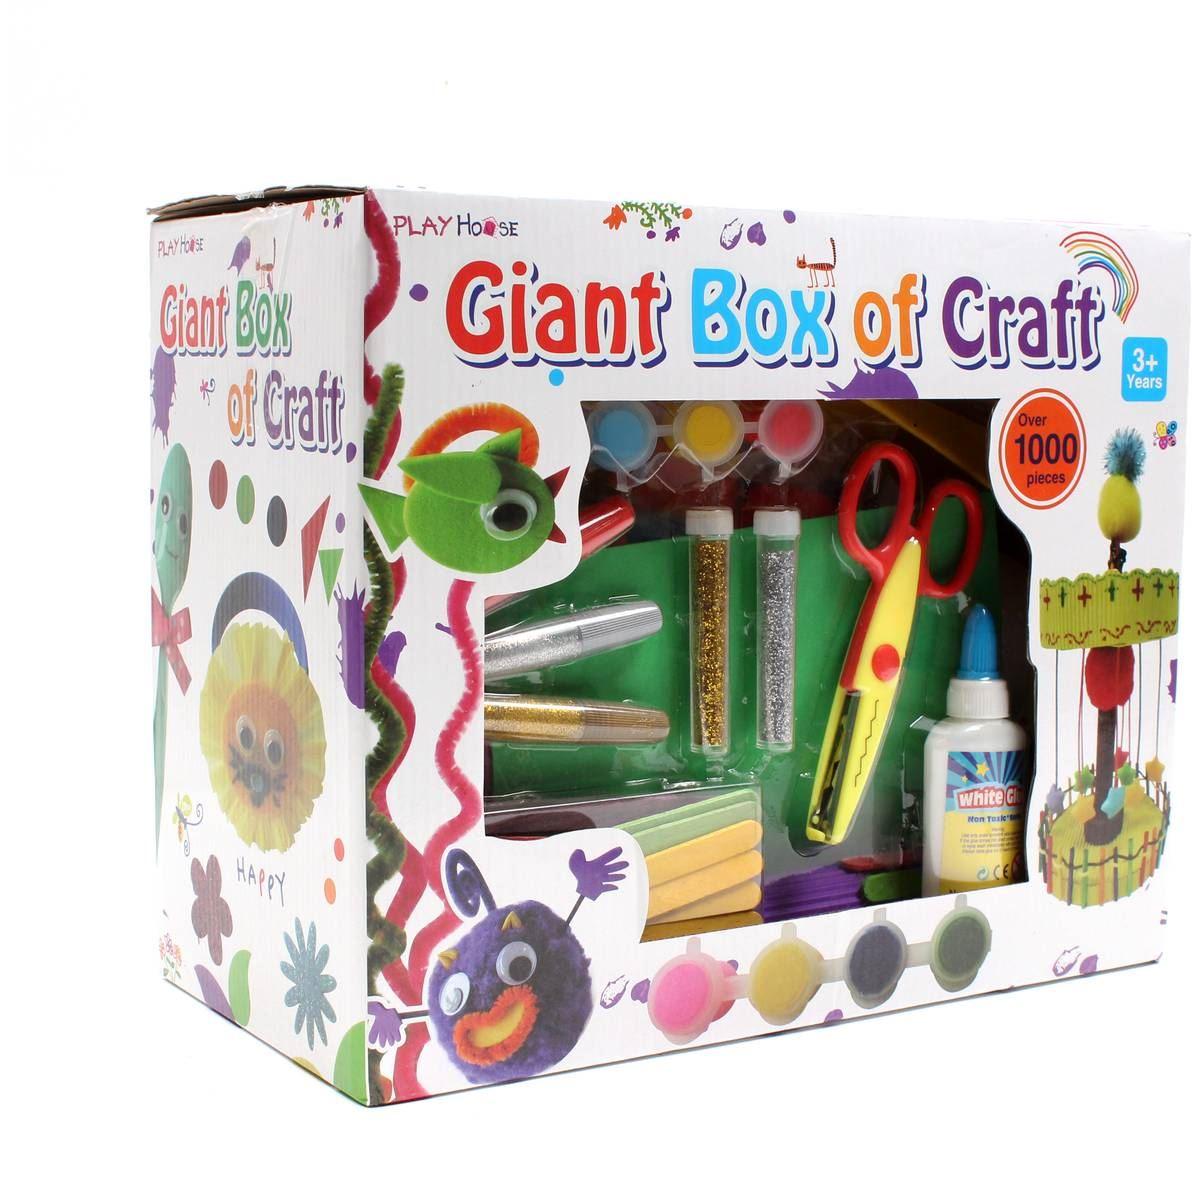 Hobbycraft Childrens Giant Box Of Craft 1000 Pieces Glue